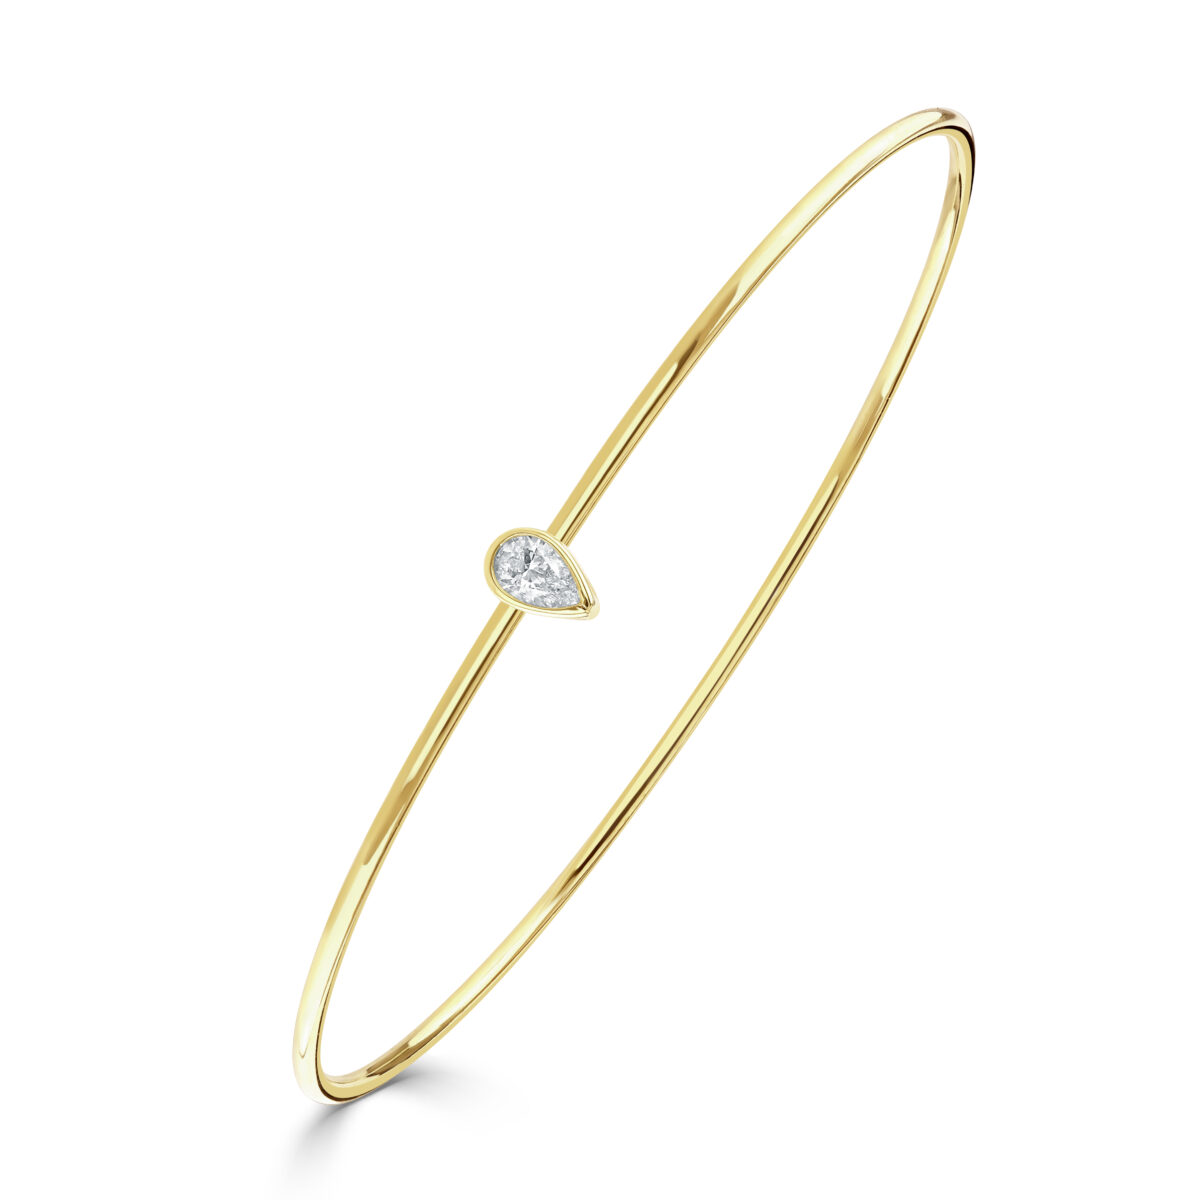 Diamond Classics Yellow Gold Pear Cut Bezel Set Diamond Bangle